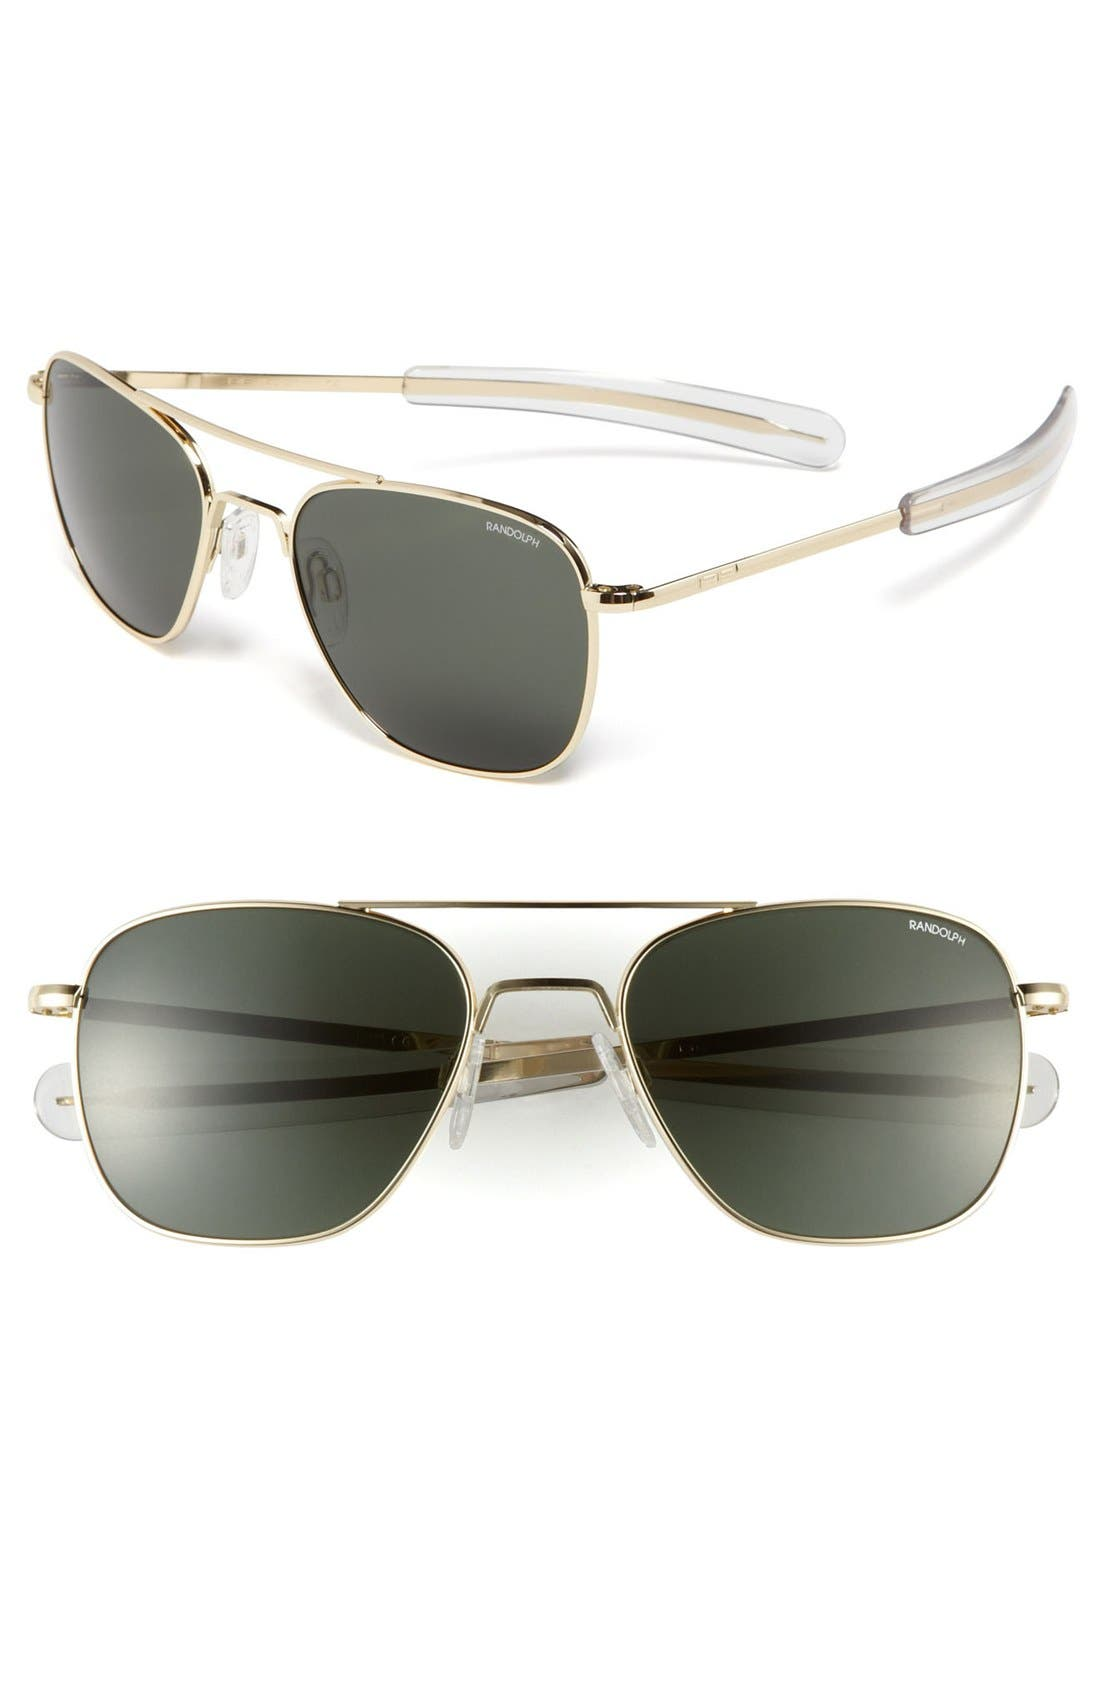 55mm Aviator Sunglasses,                             Main thumbnail 1, color,                             711